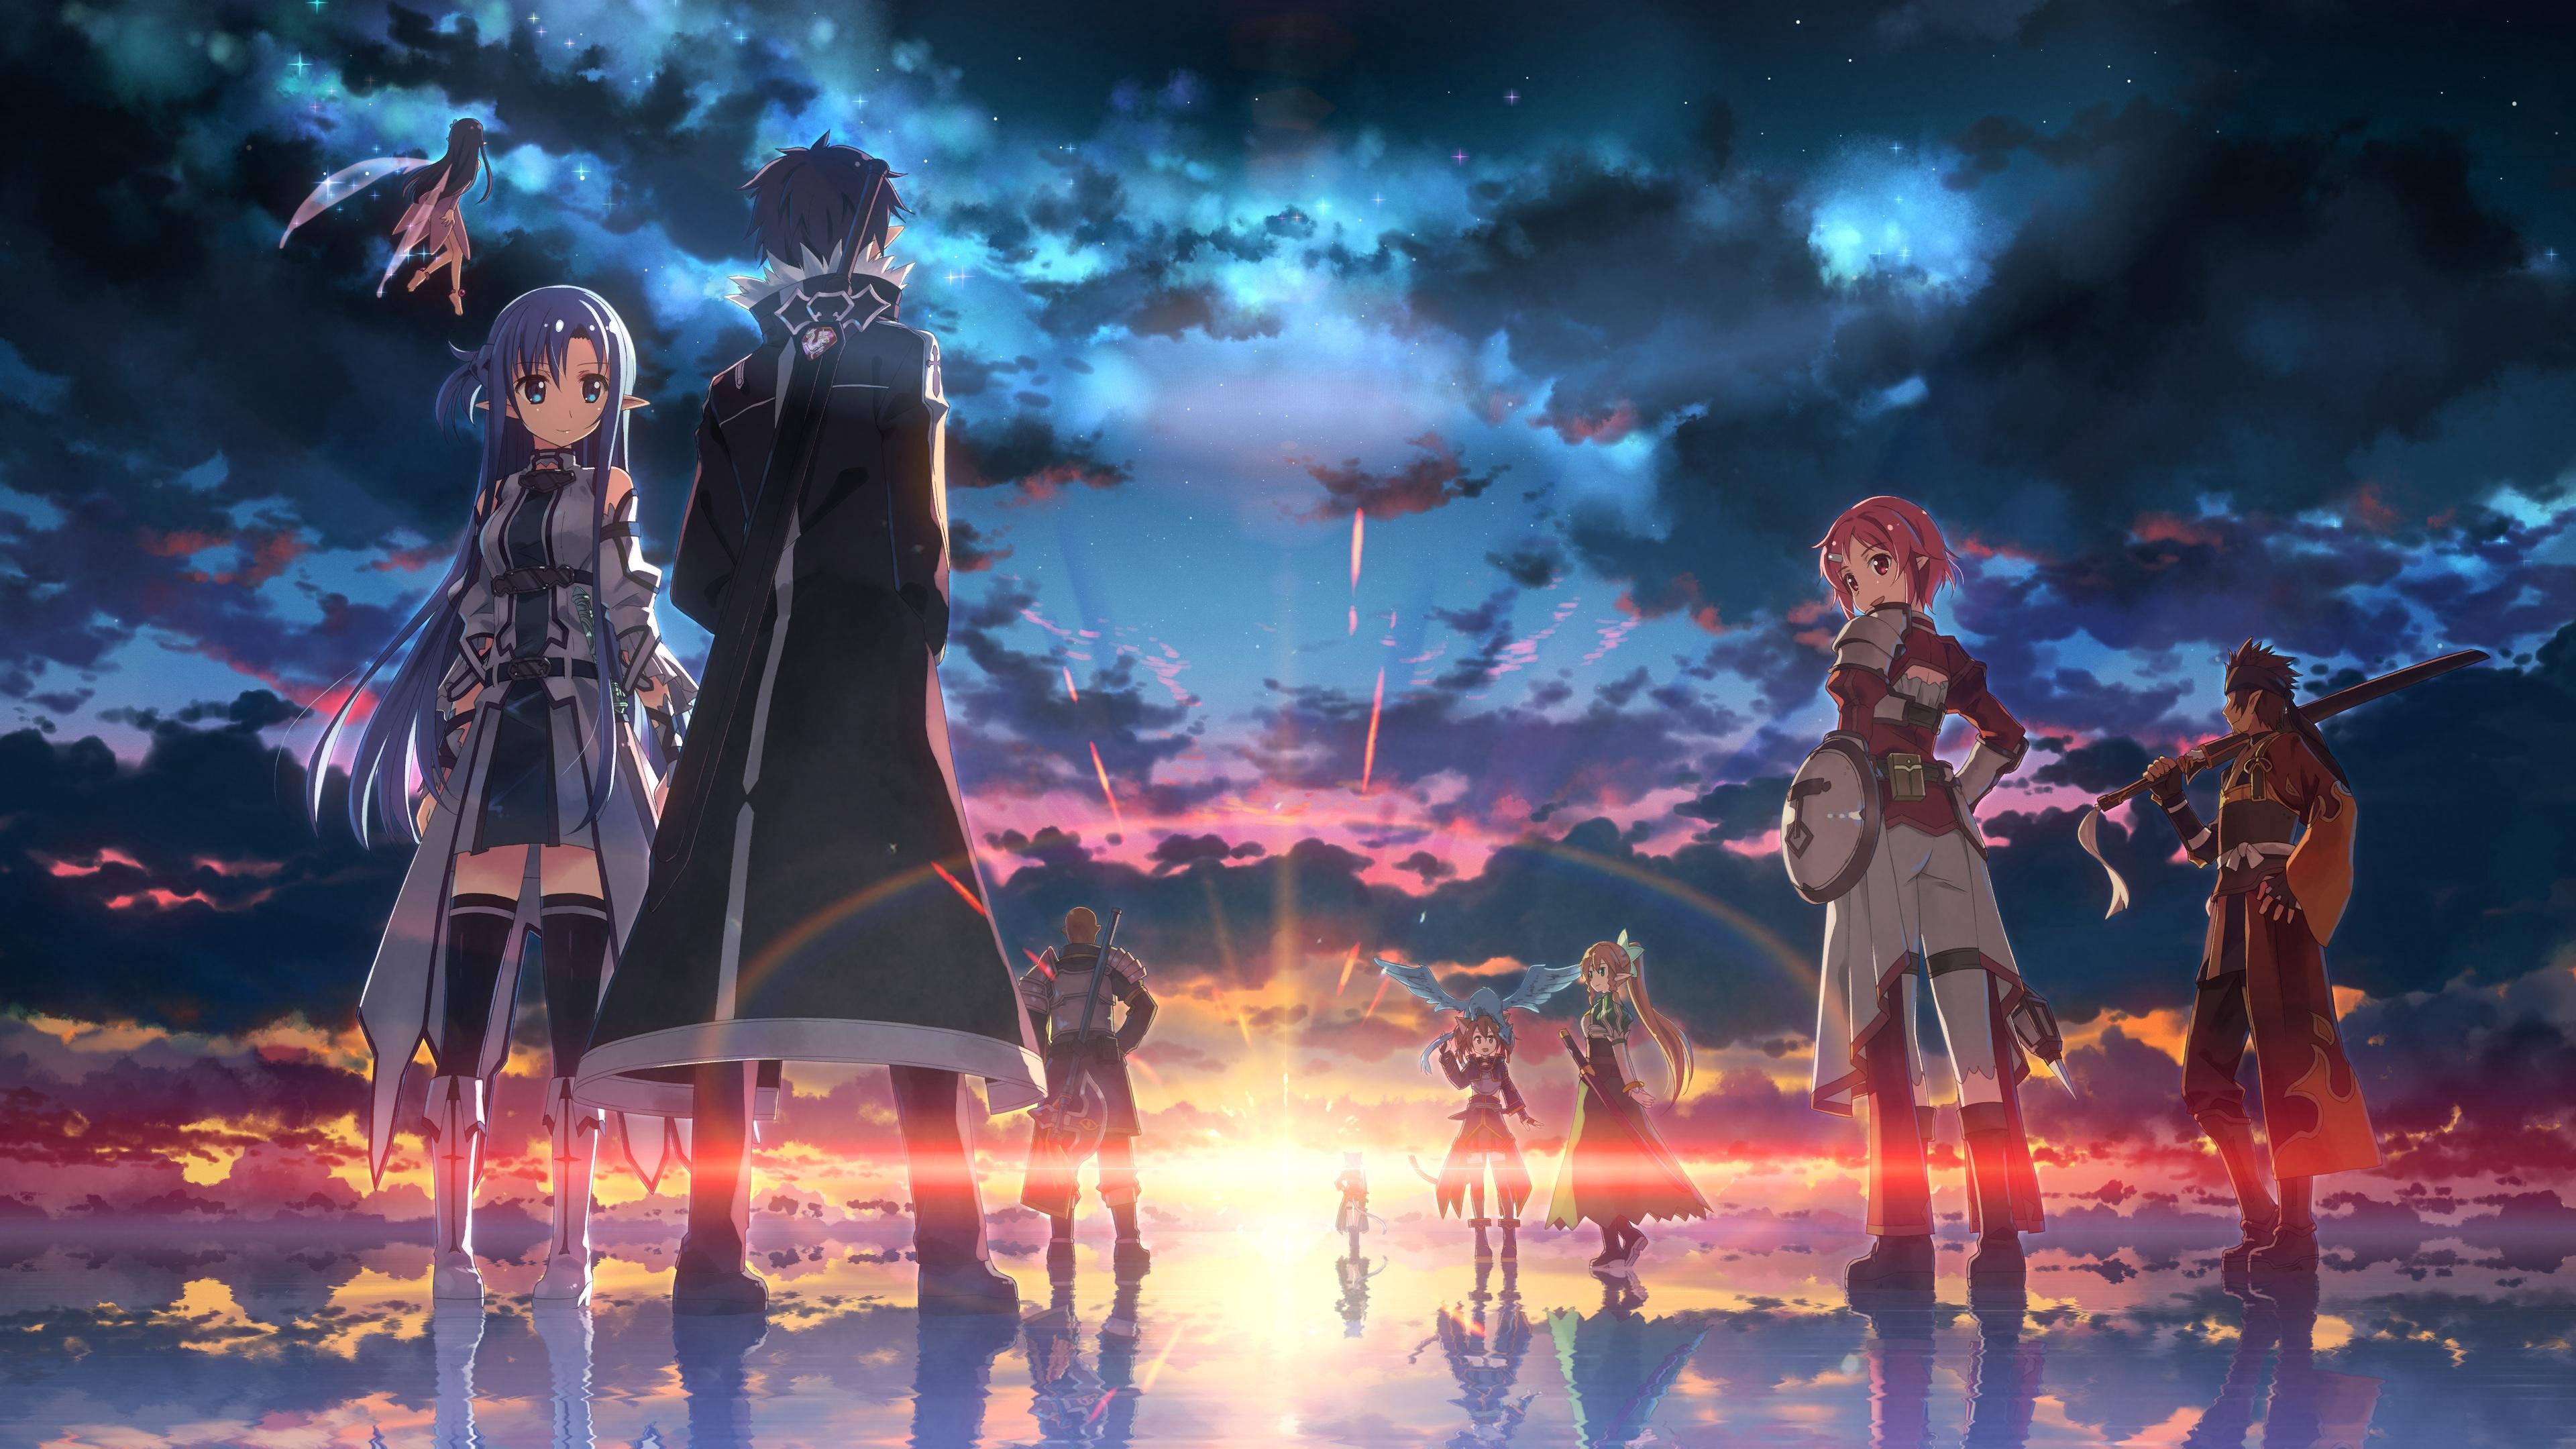 Yndlings Sword Art Online anime person